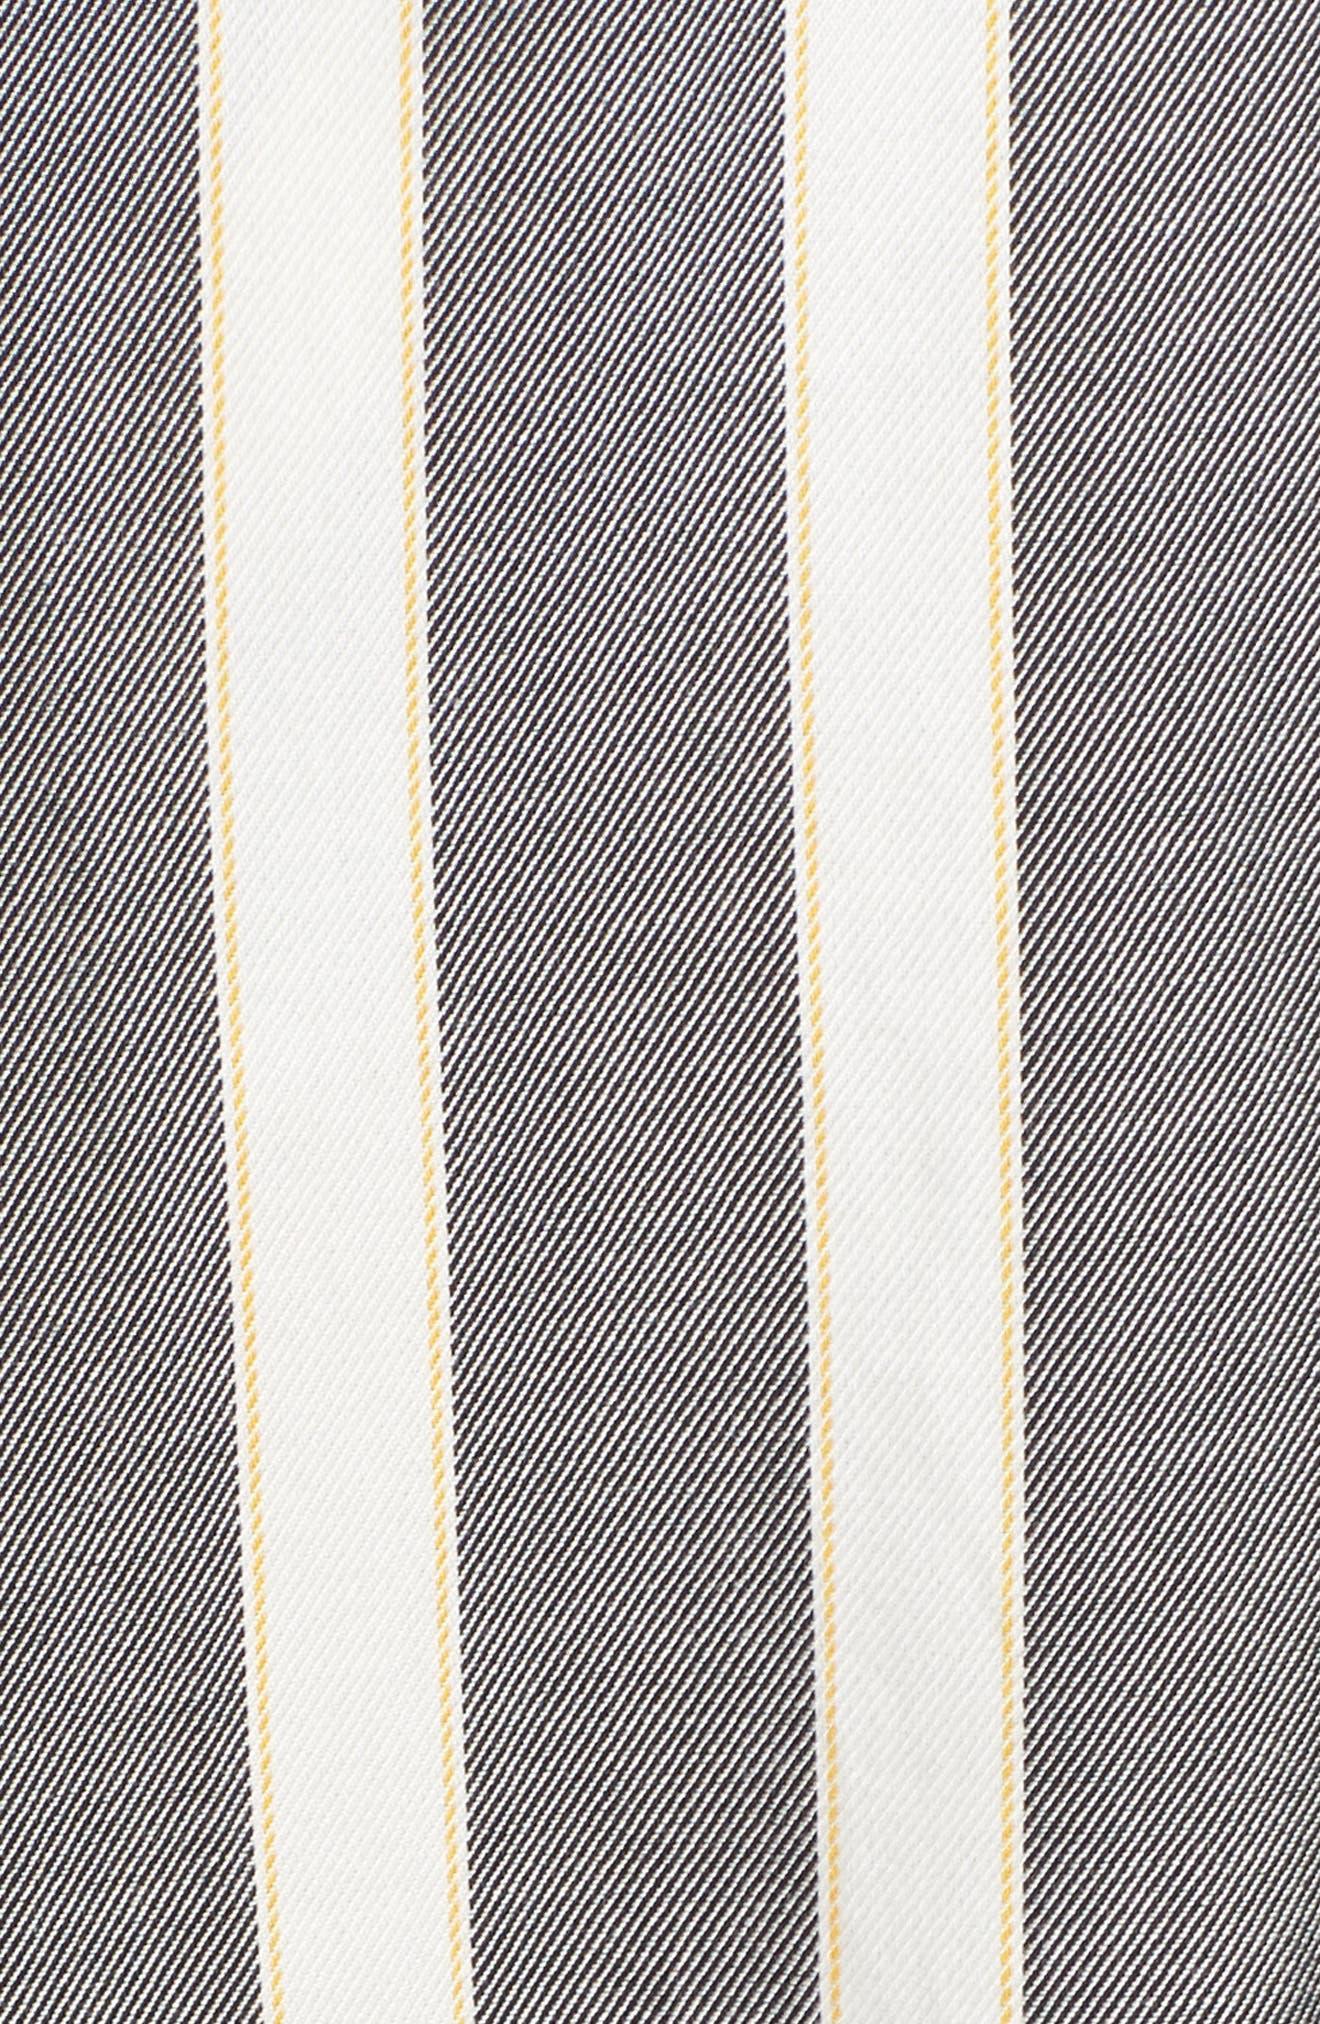 Haze Shirtdress,                             Alternate thumbnail 6, color,                             001